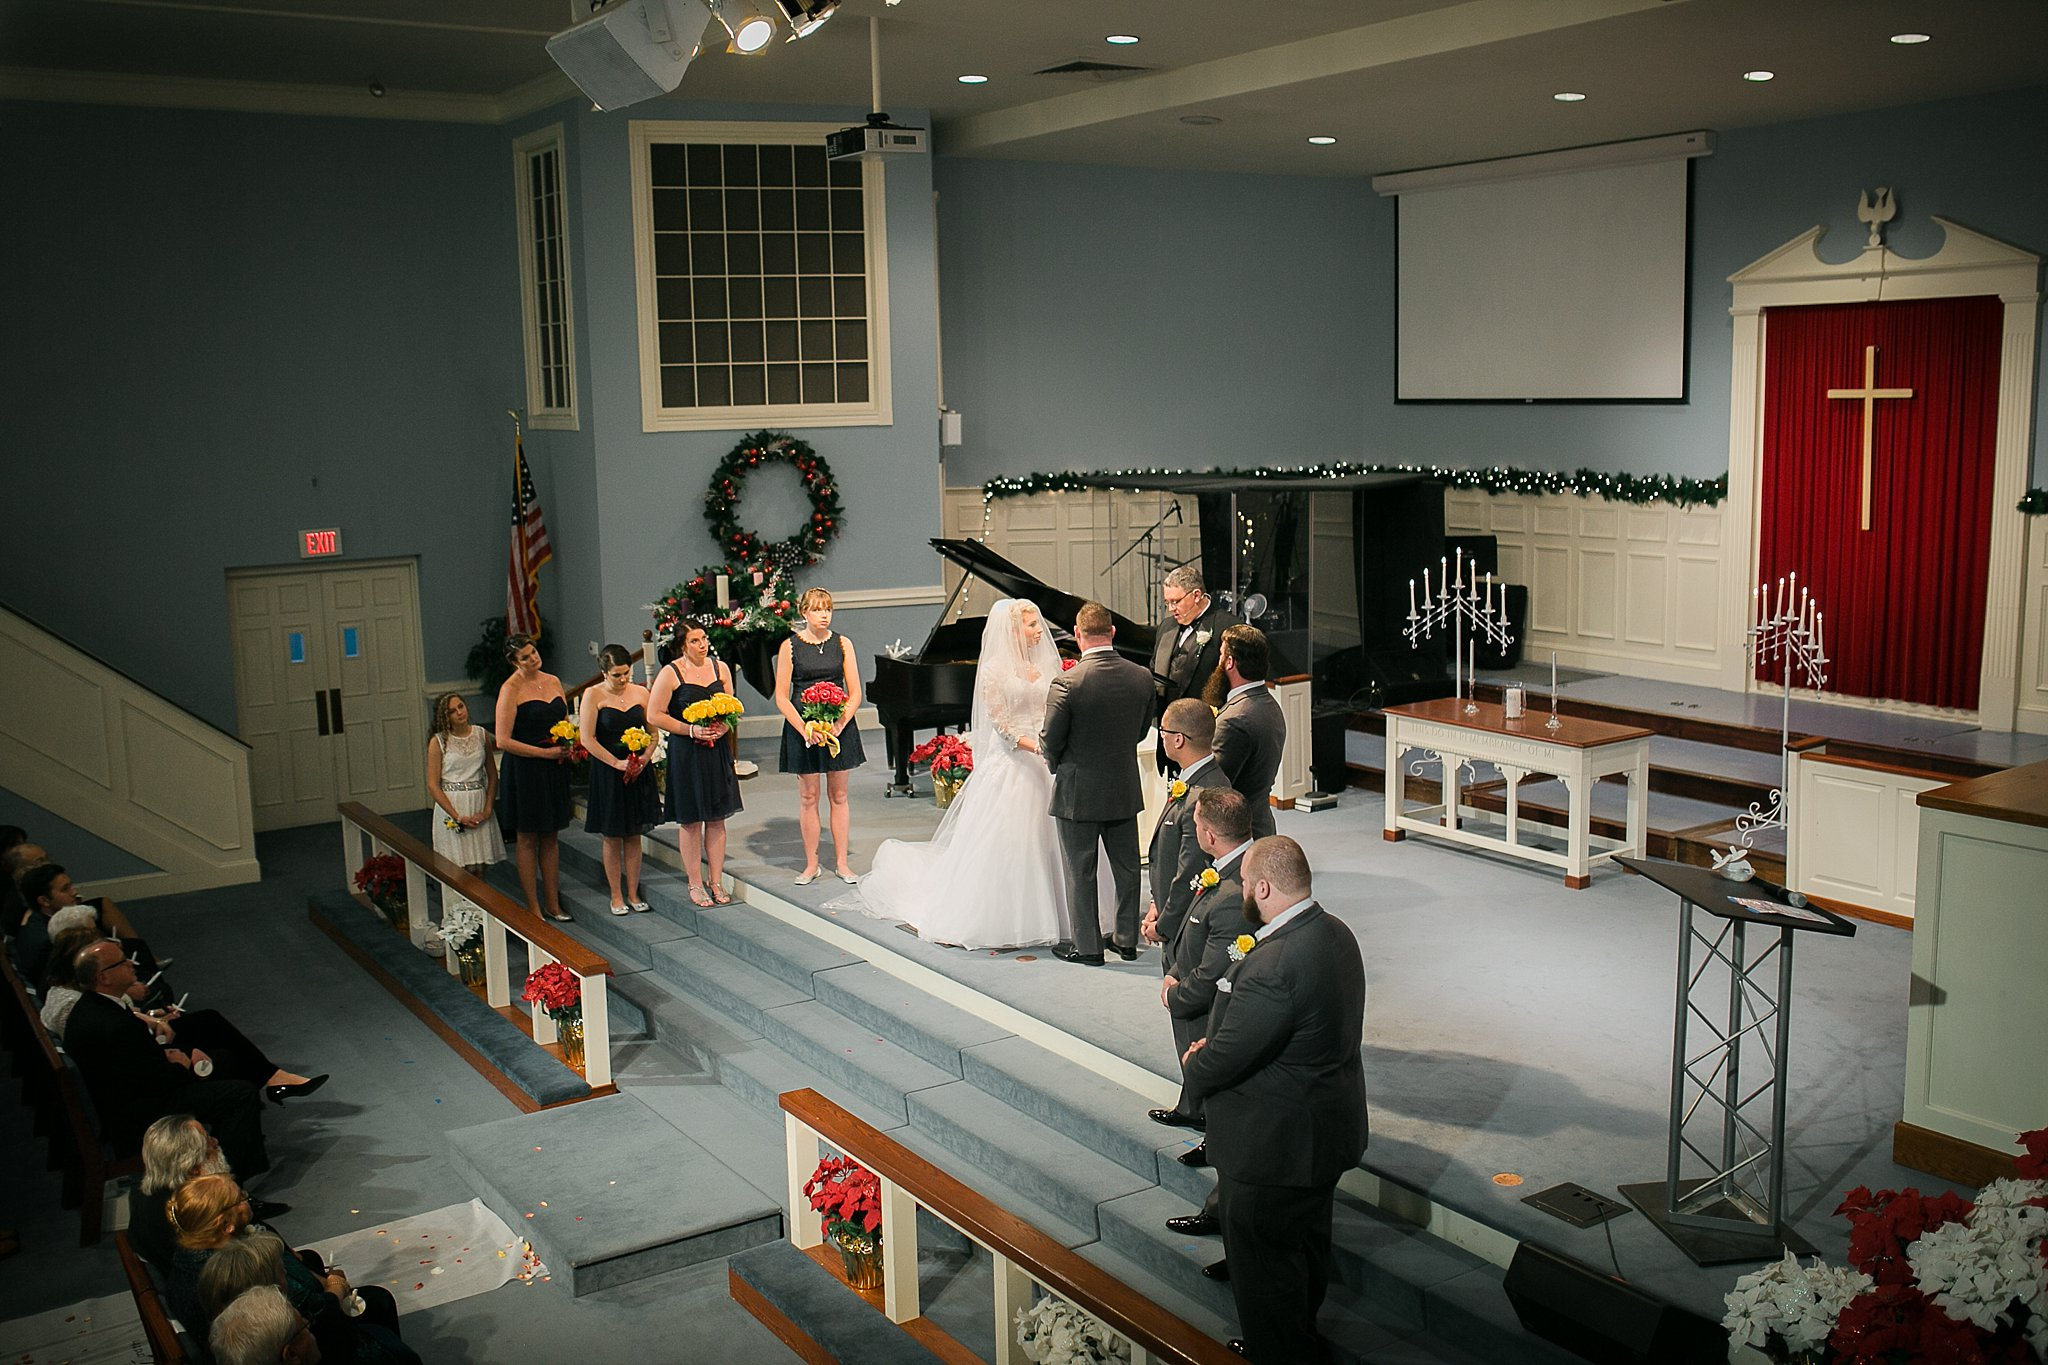 Wollaston Church of the Nazarene Wedding Boston Wedding Photographer14.jpg